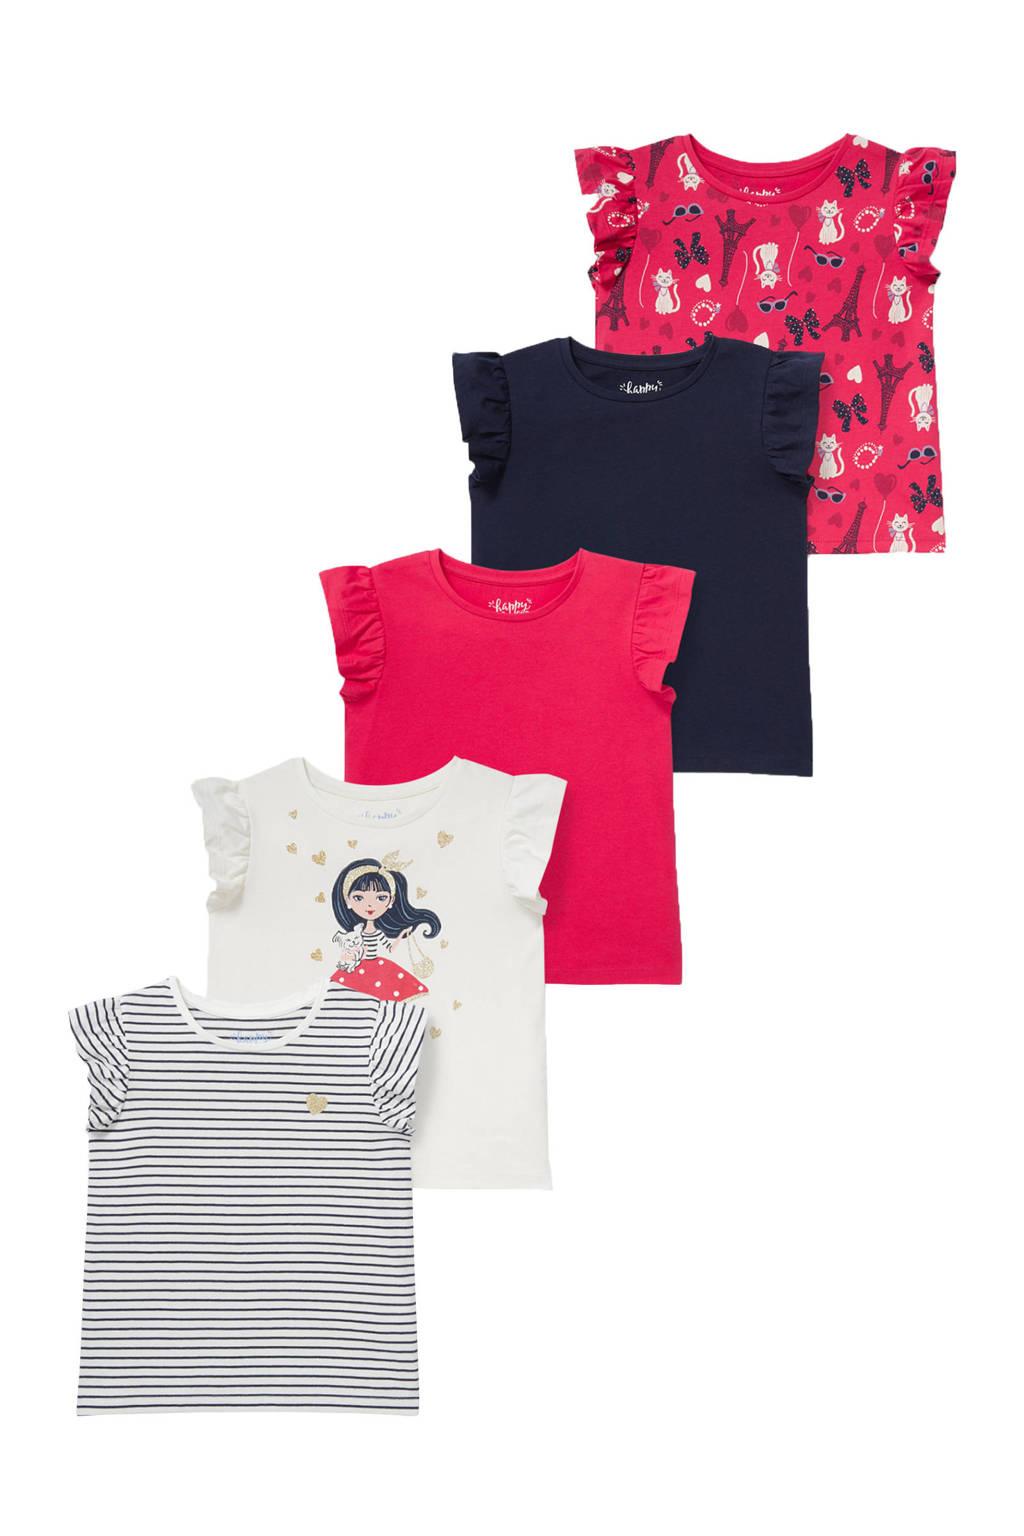 C&A Happy girls Club T-shirt - set van 5 wit/rood/donkerblauw